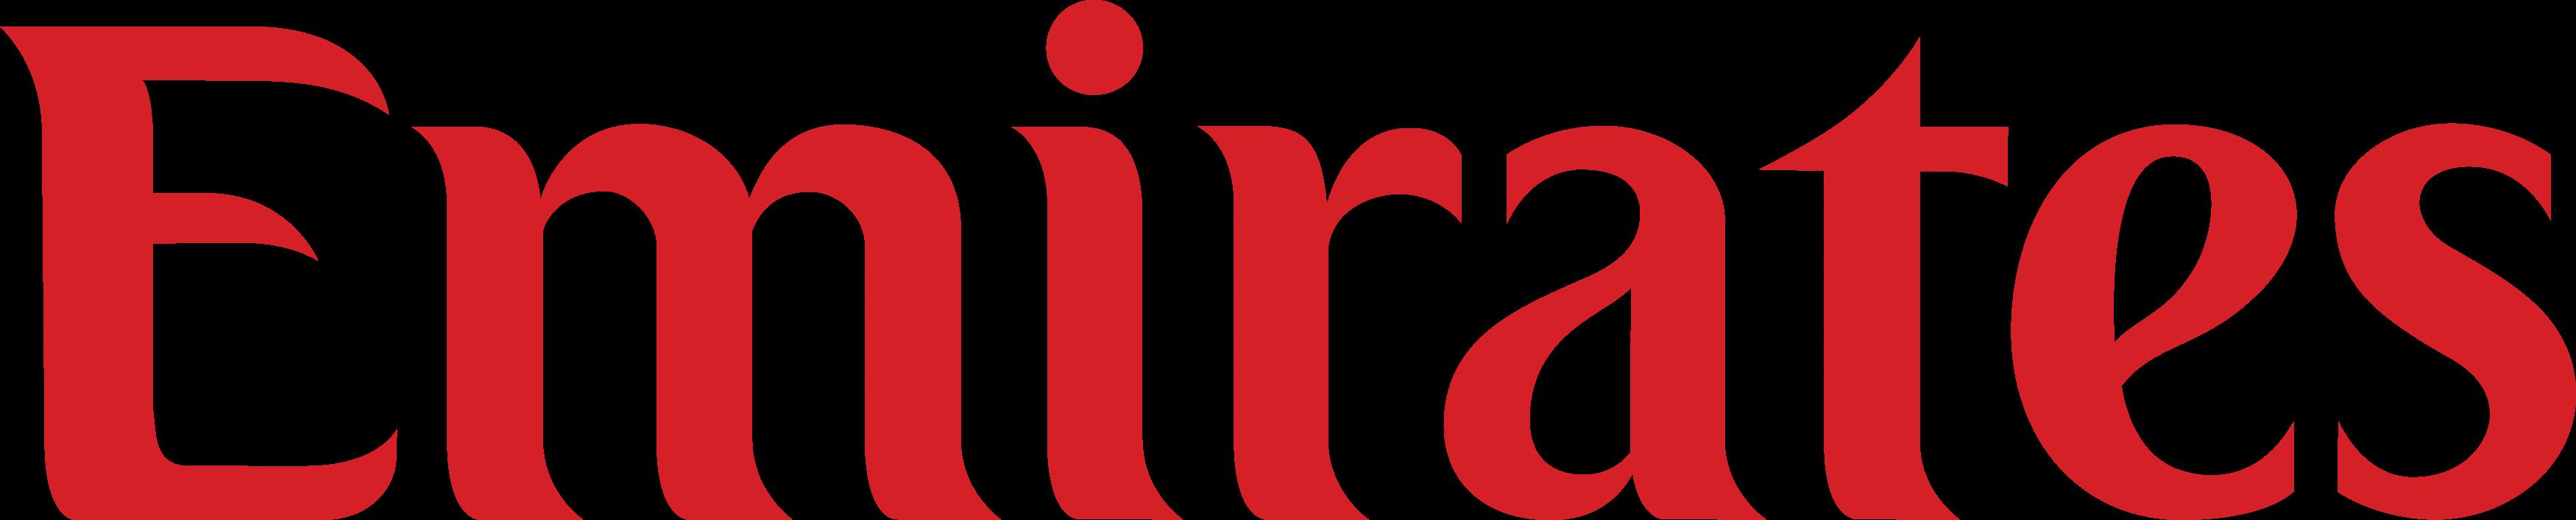 emirates logo logodownloadorg download de logotipos